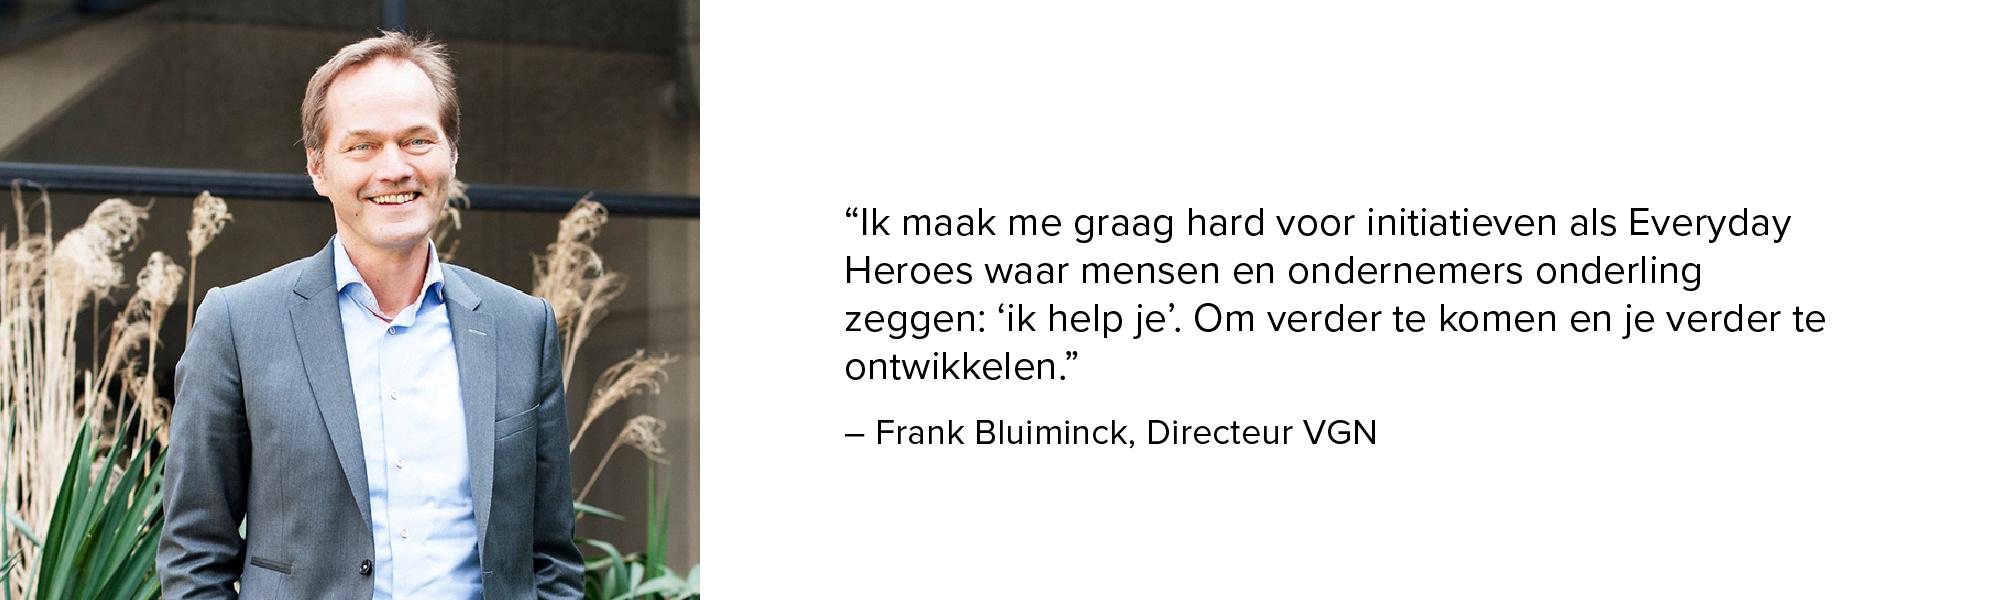 Frank Bluiminck@2x-100.jpg